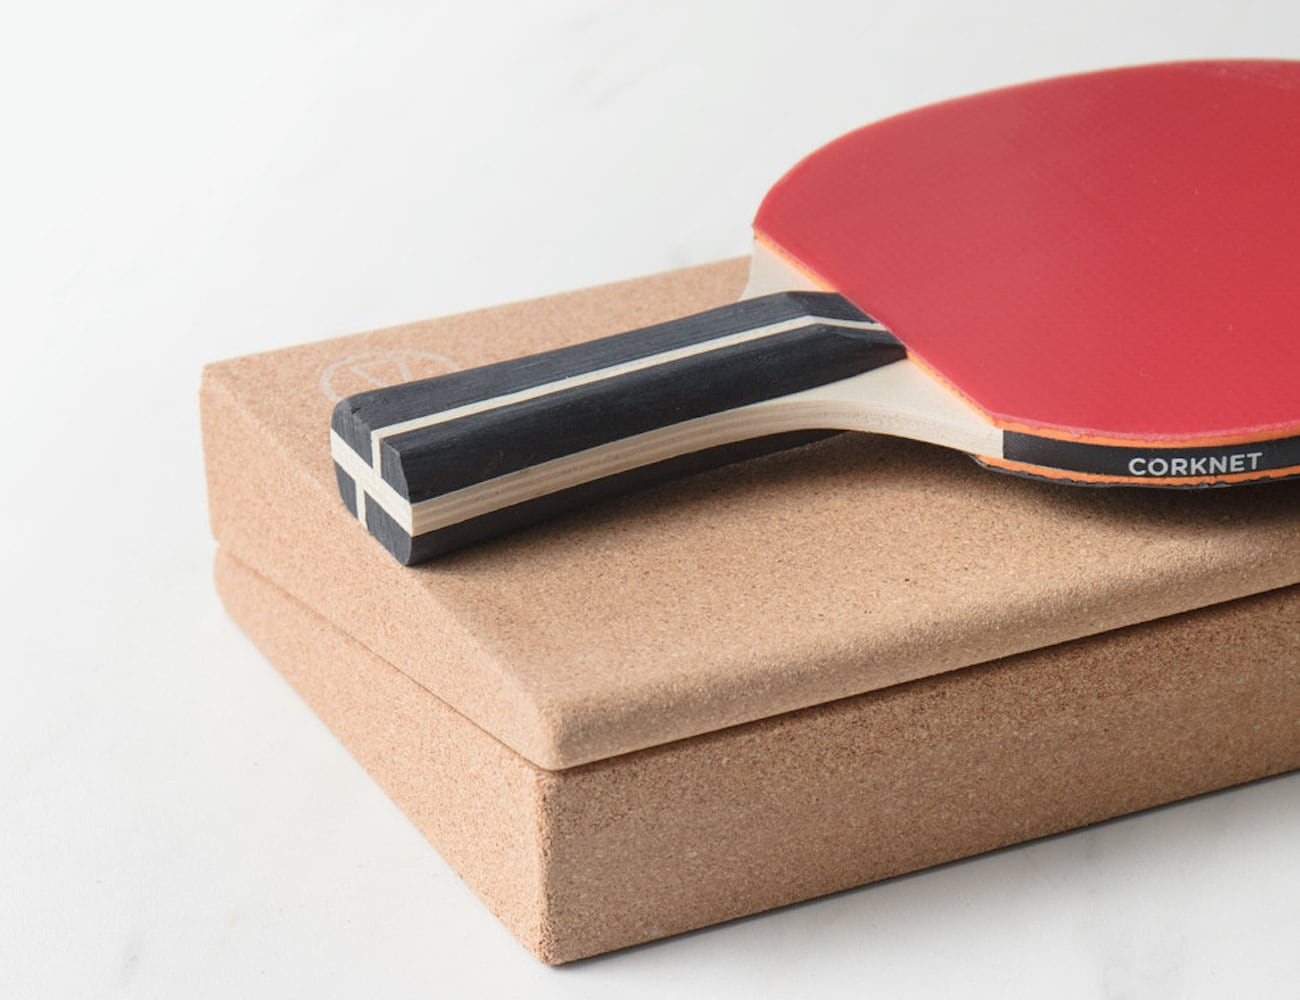 Corknet Portable Pop Up Ping Pong Set